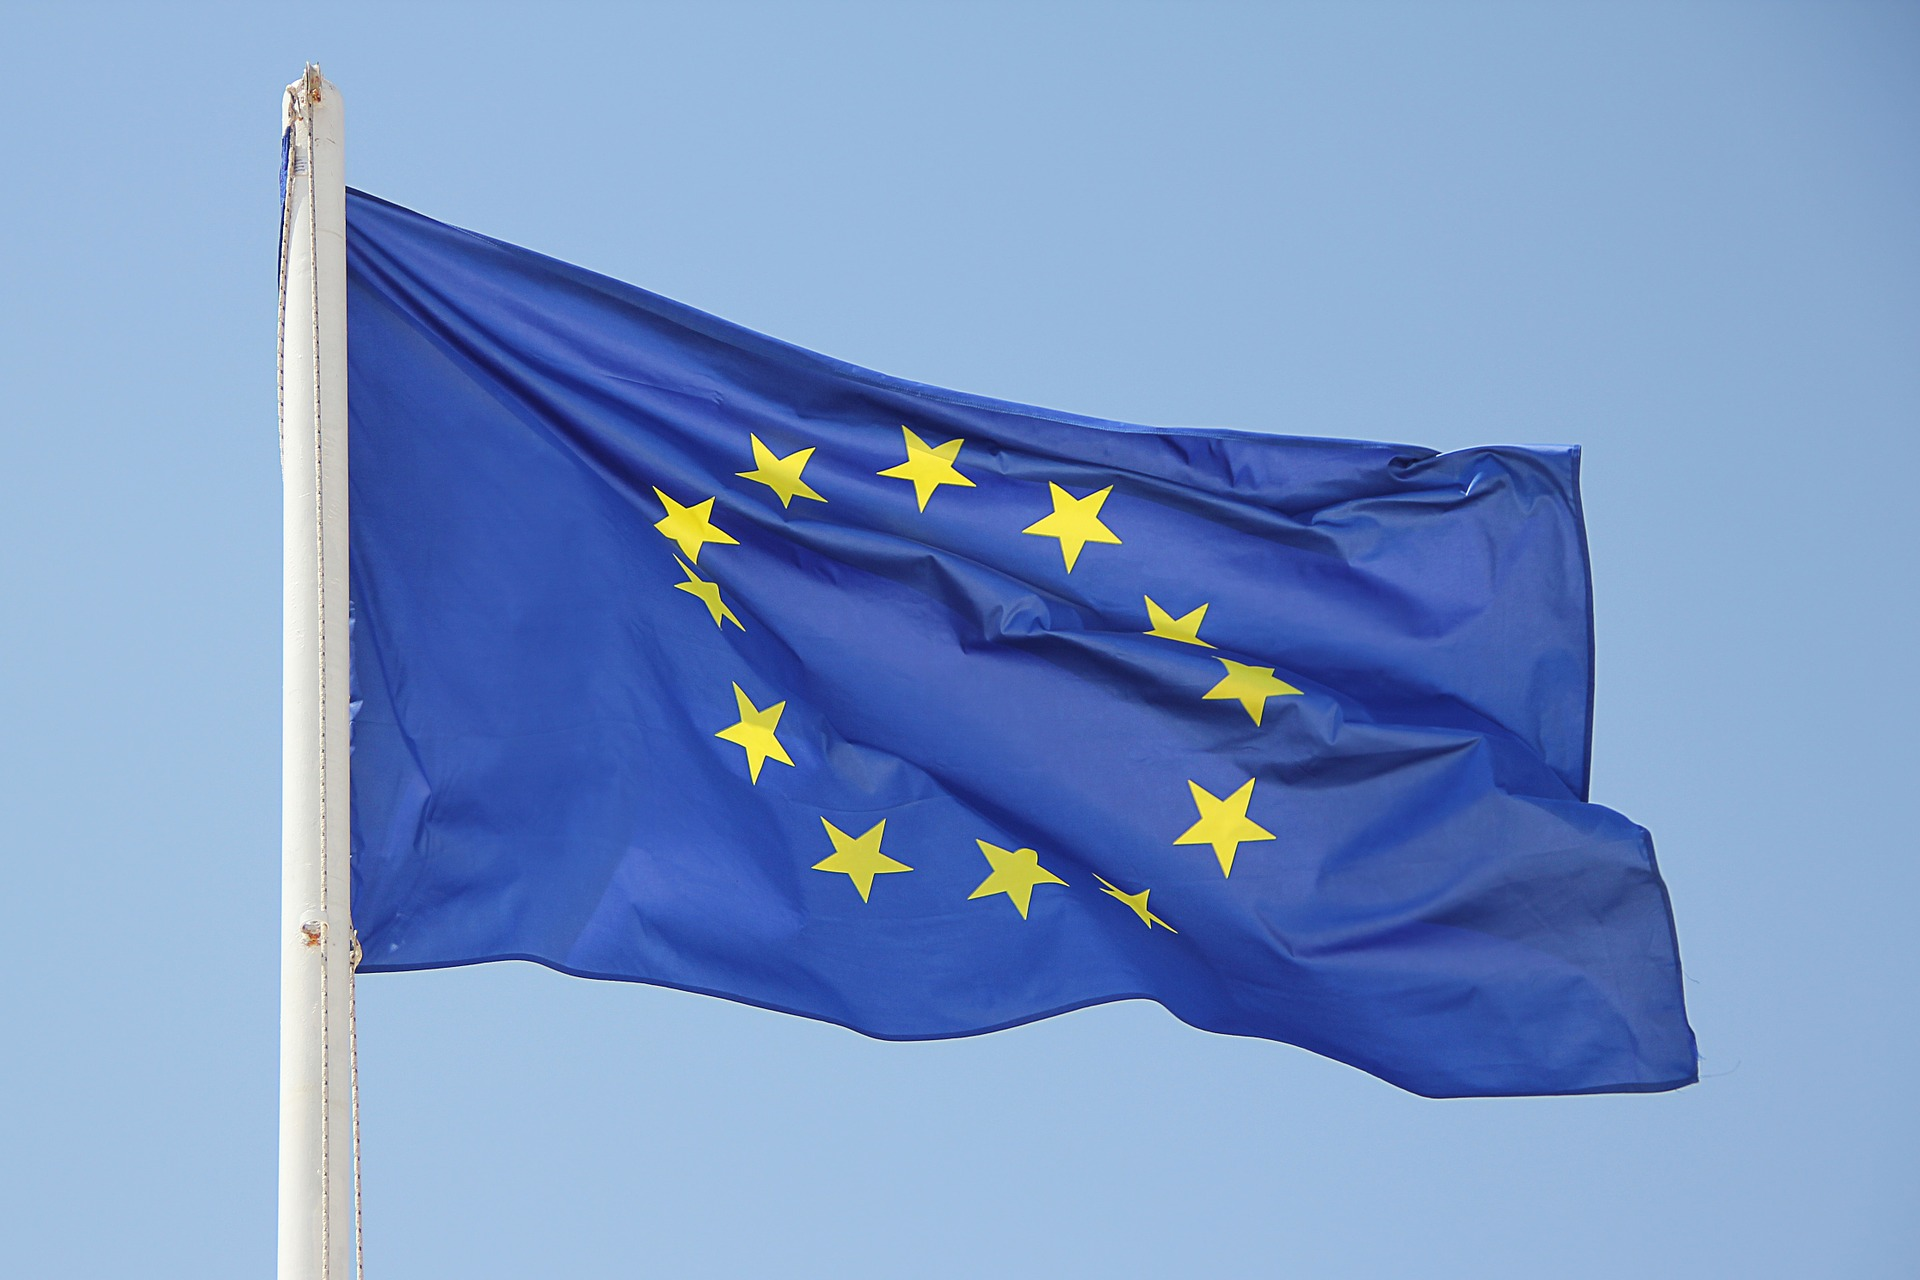 eu_flag_gregmontani_cc0.jpg